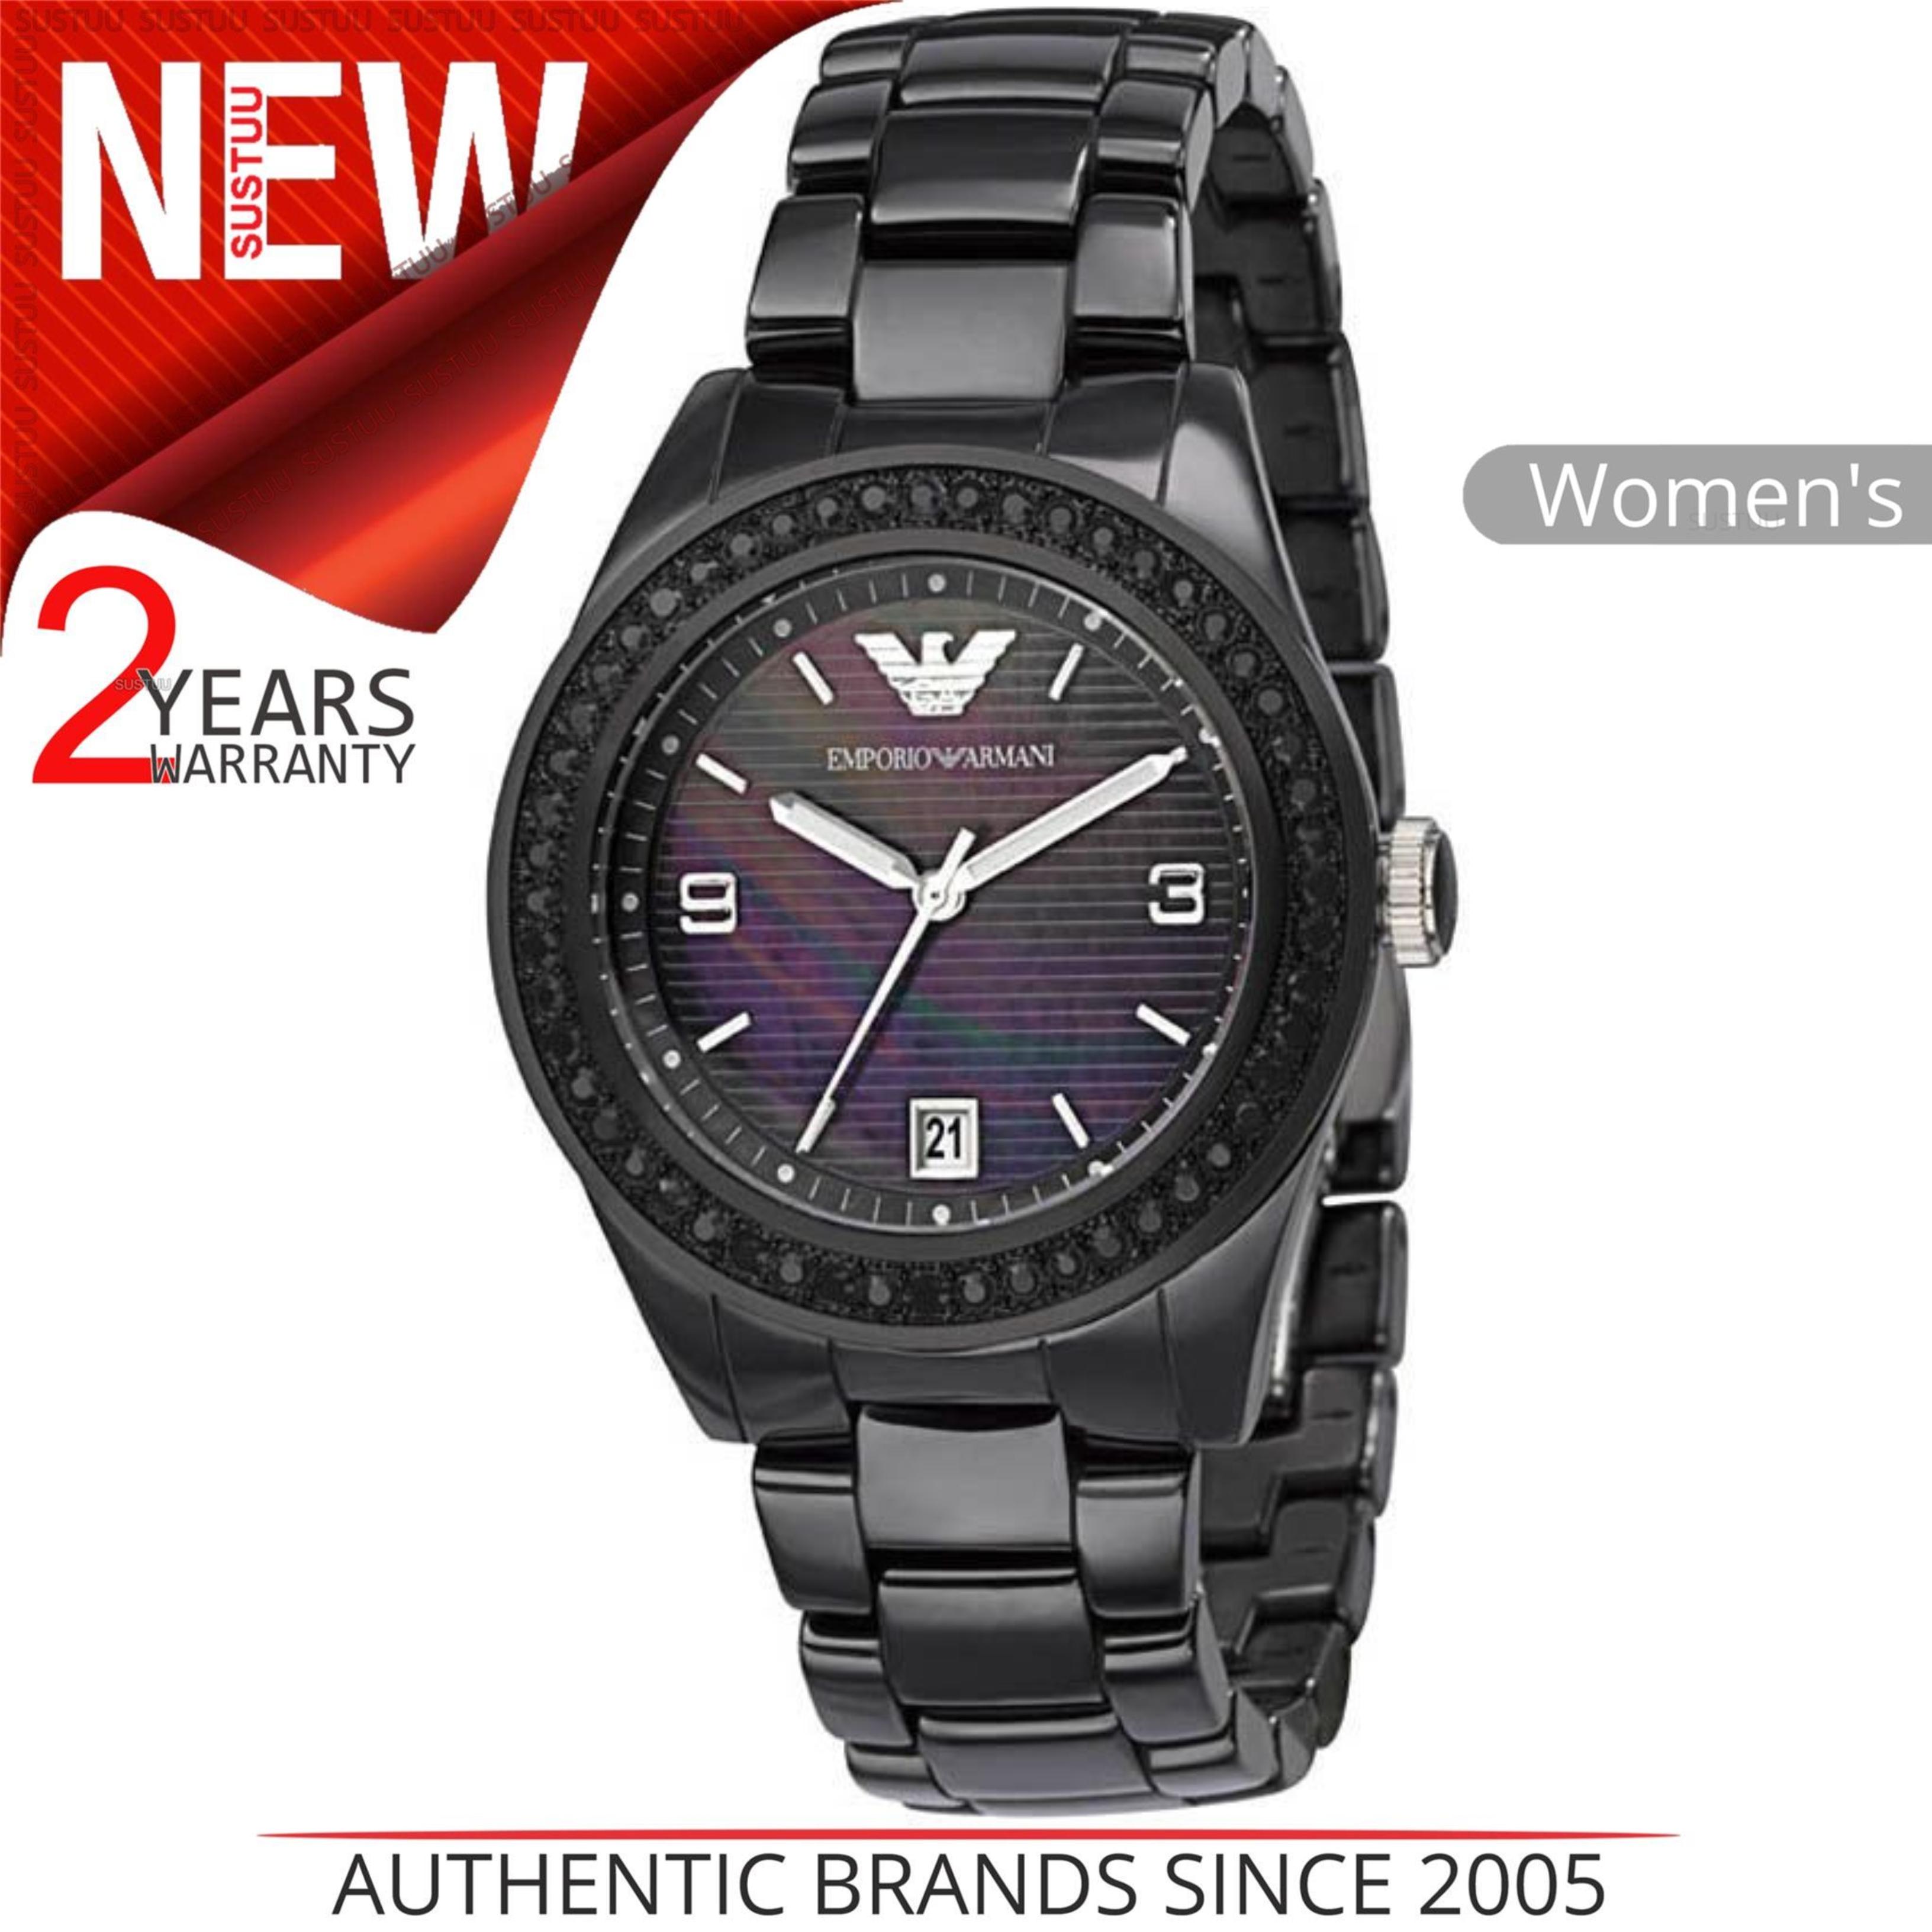 97d933fbd6cc CENTINELA Emporio Armani Ceramica señoras Watch│Black cristal madre de  perla Dial│AR1423